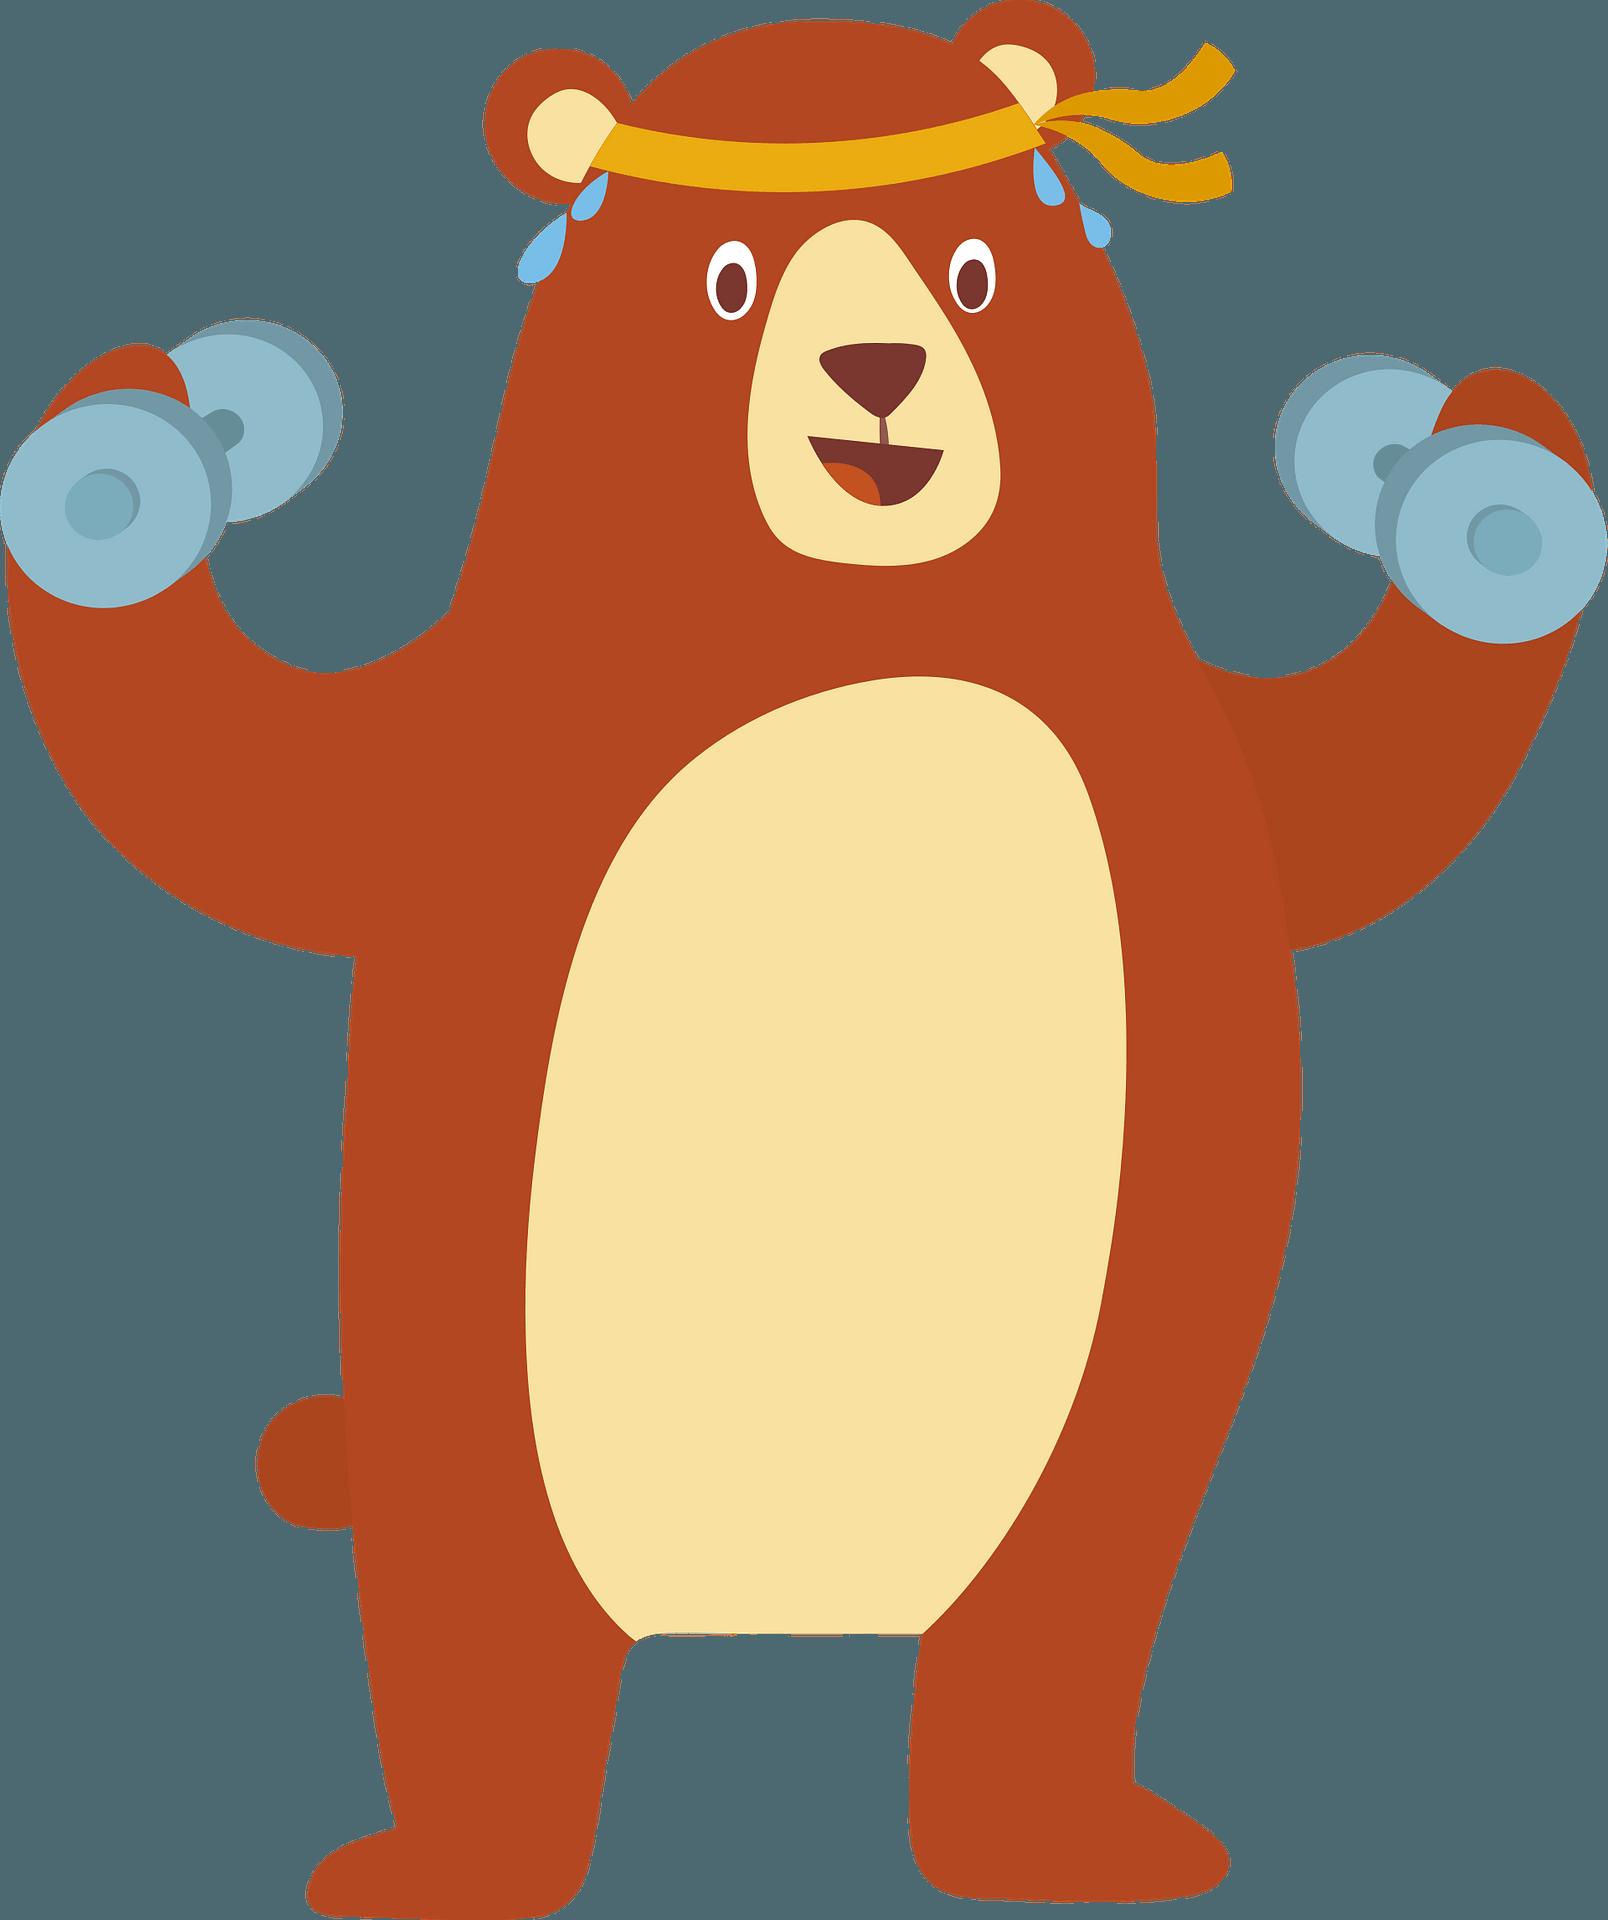 Bear Do Exercises Clipart Free Download Transparent Png Creazilla